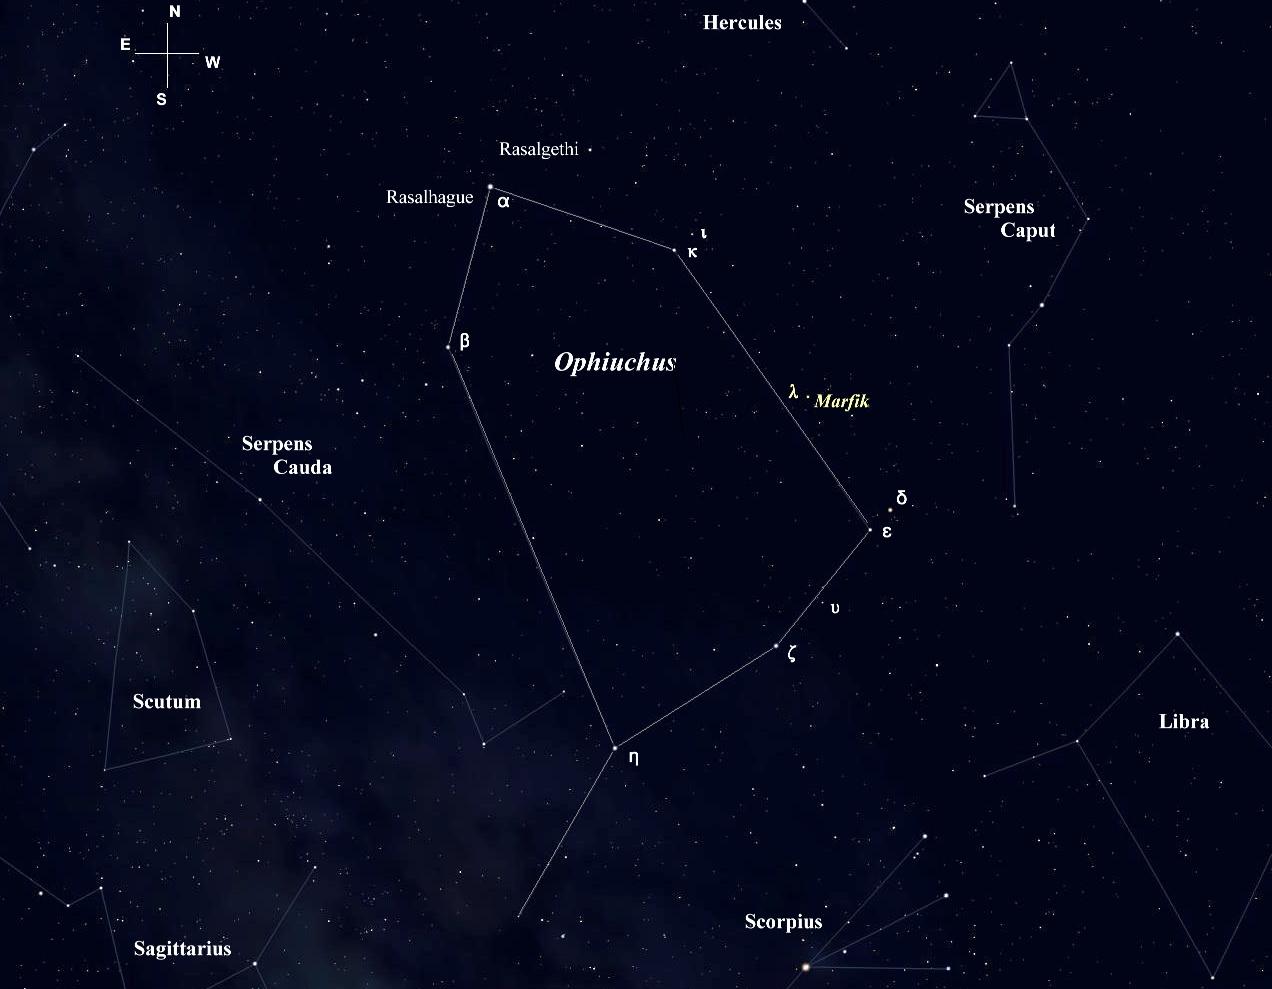 Marvelous Marfik, an Ophiuchan Jewel   Star-Splitters